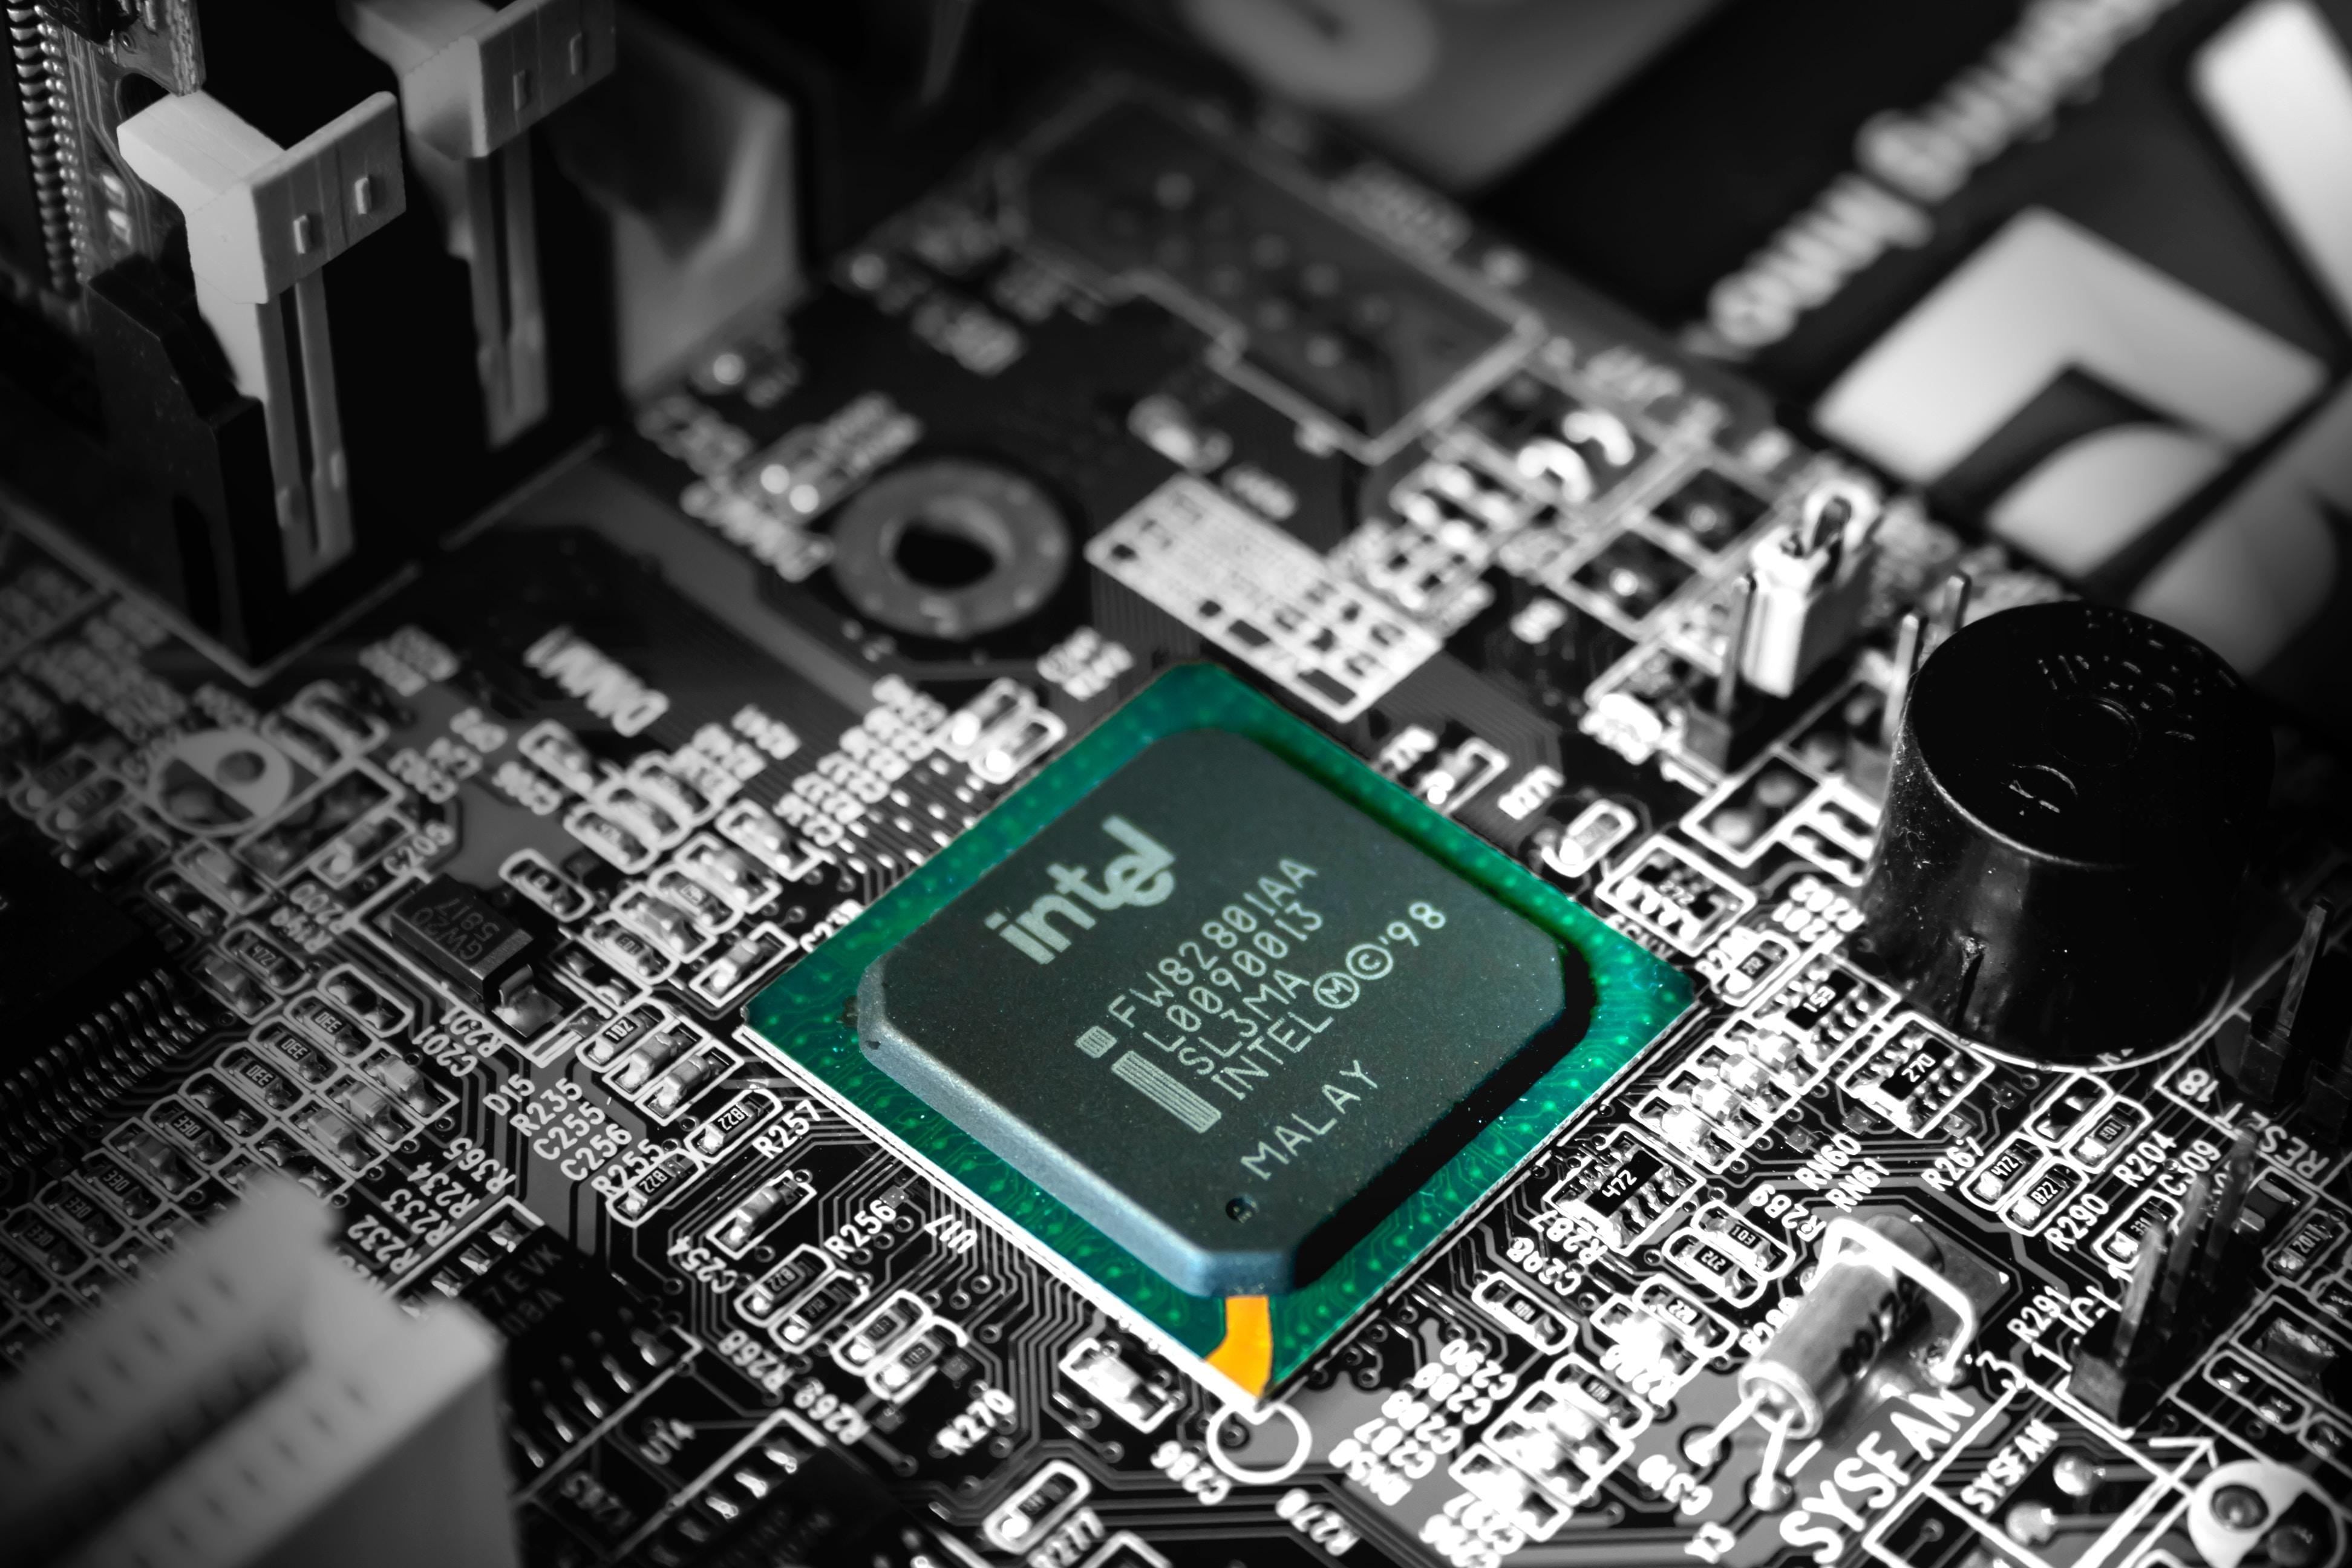 Should Intel Buy Mellanox? - Intel Corporation (NASDAQ:INTC